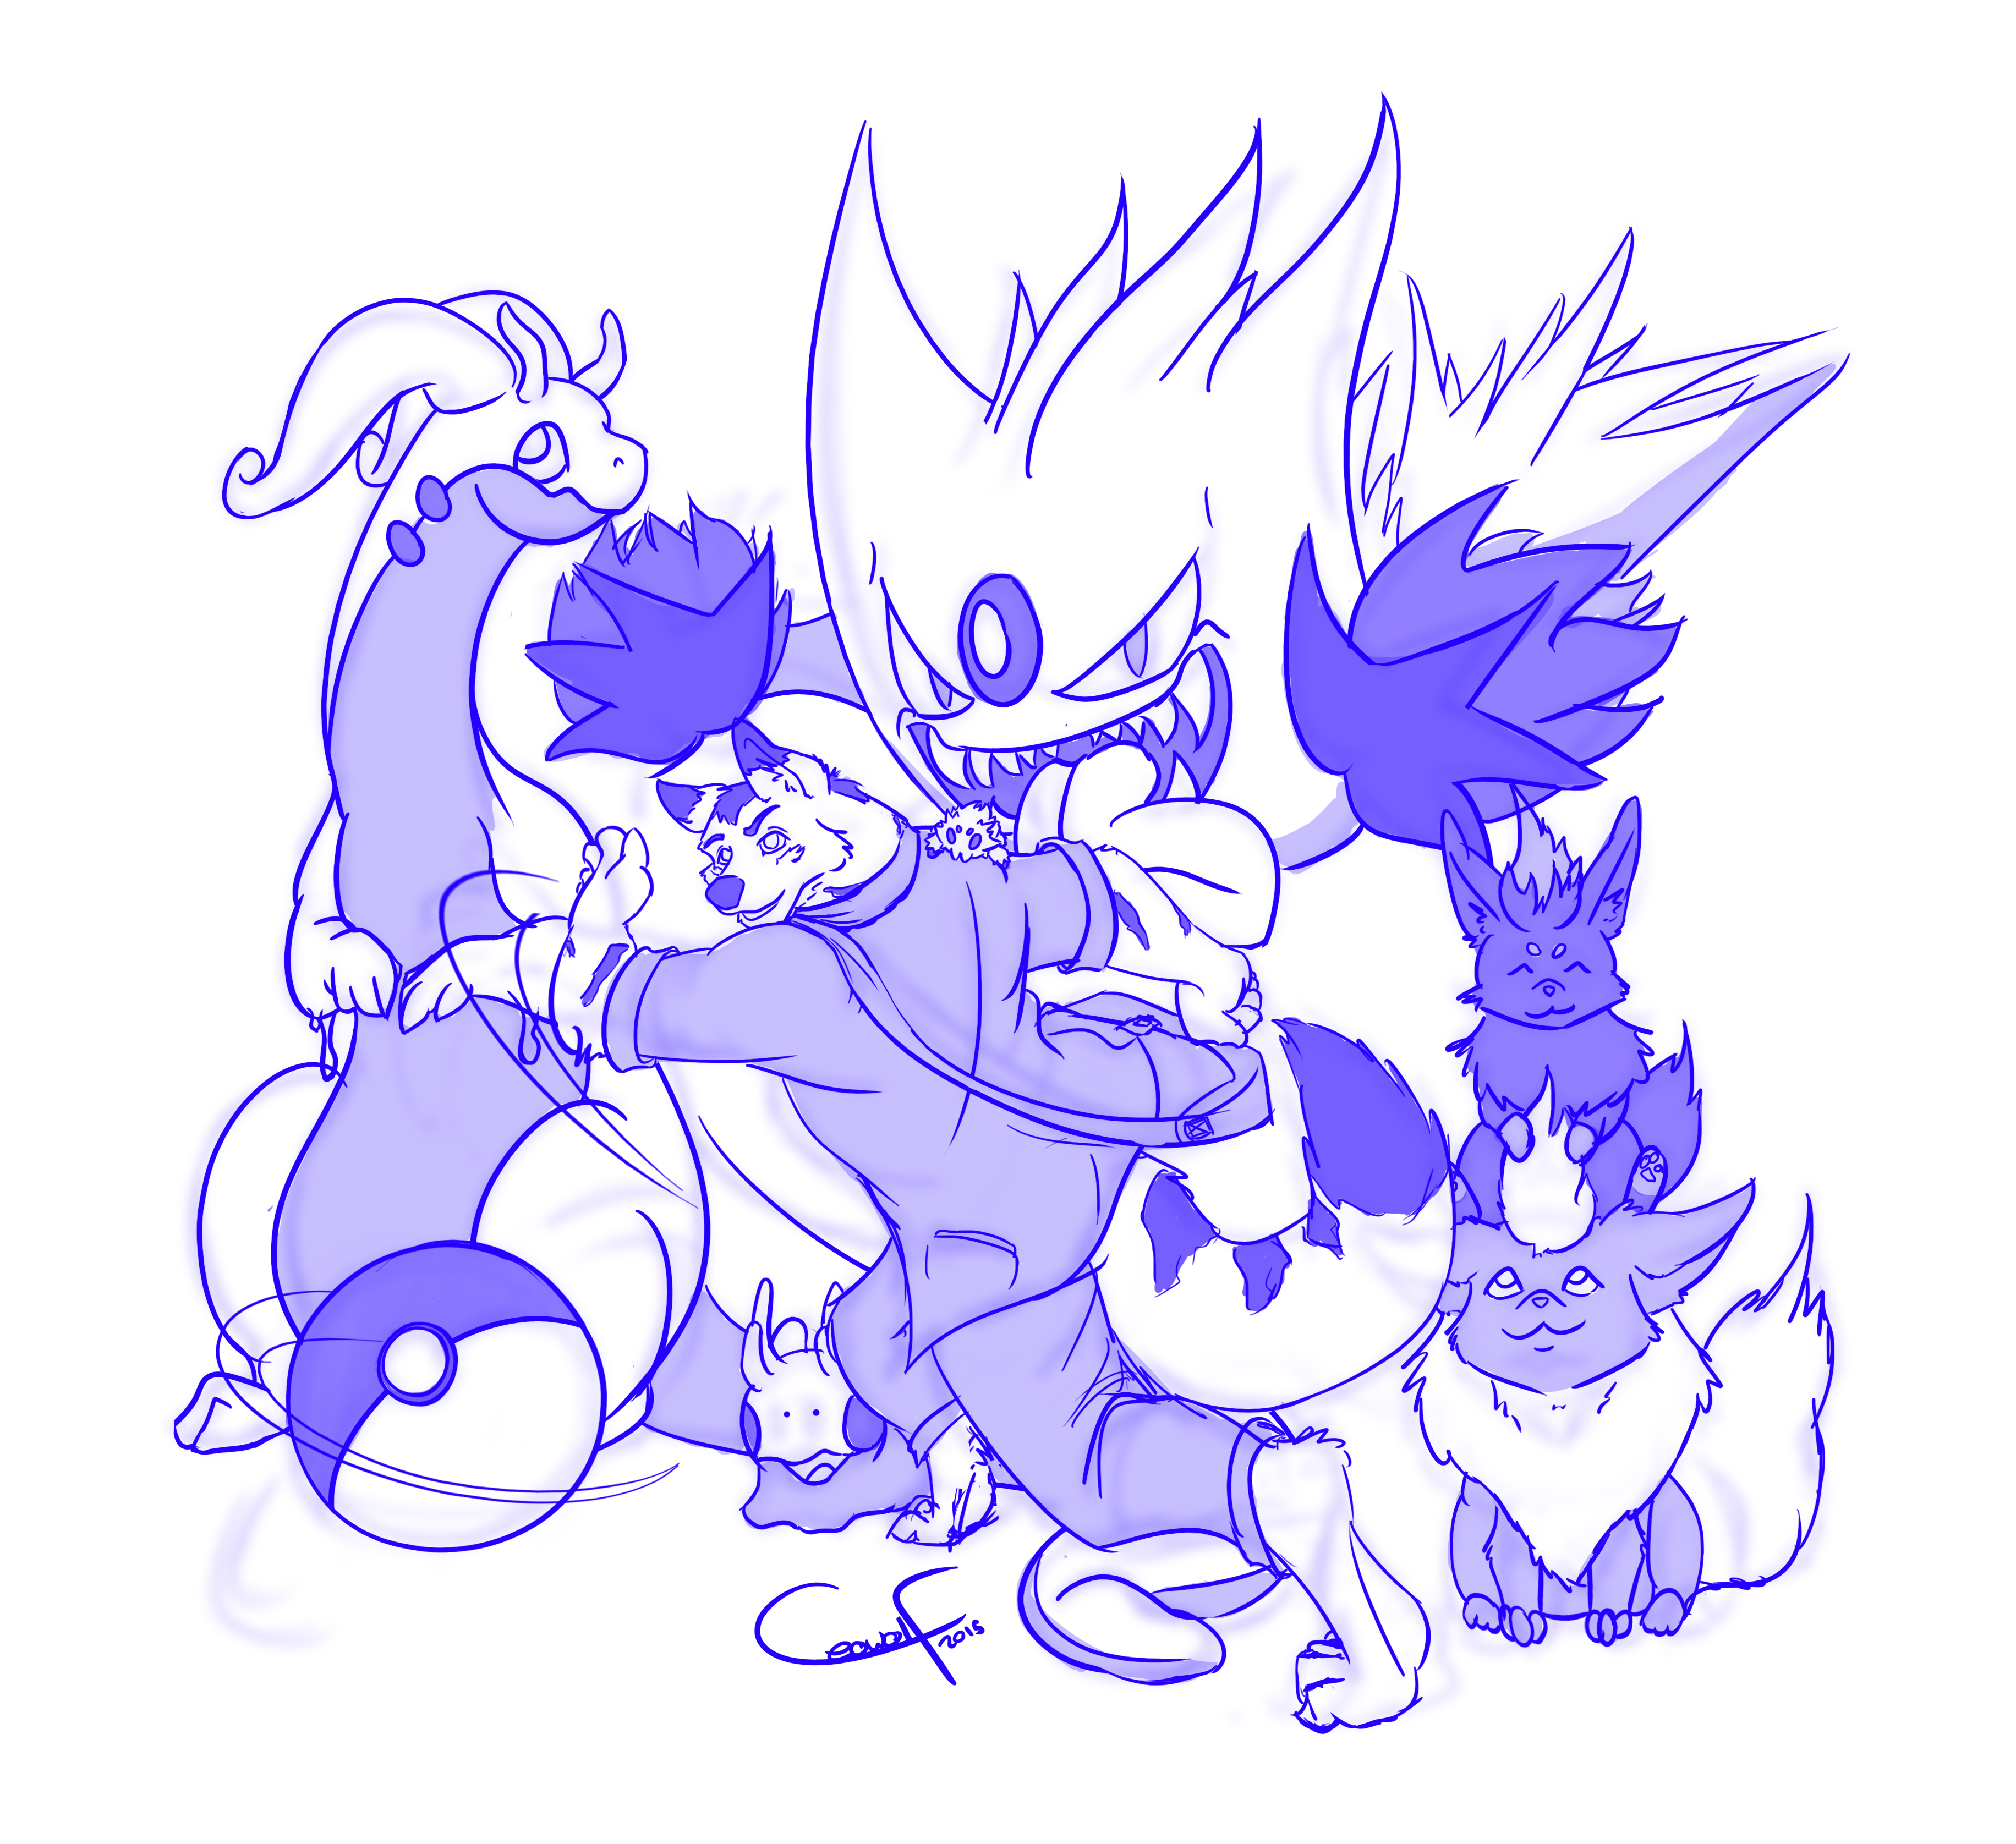 Pokemon Dream Team Sketch — Weasyl